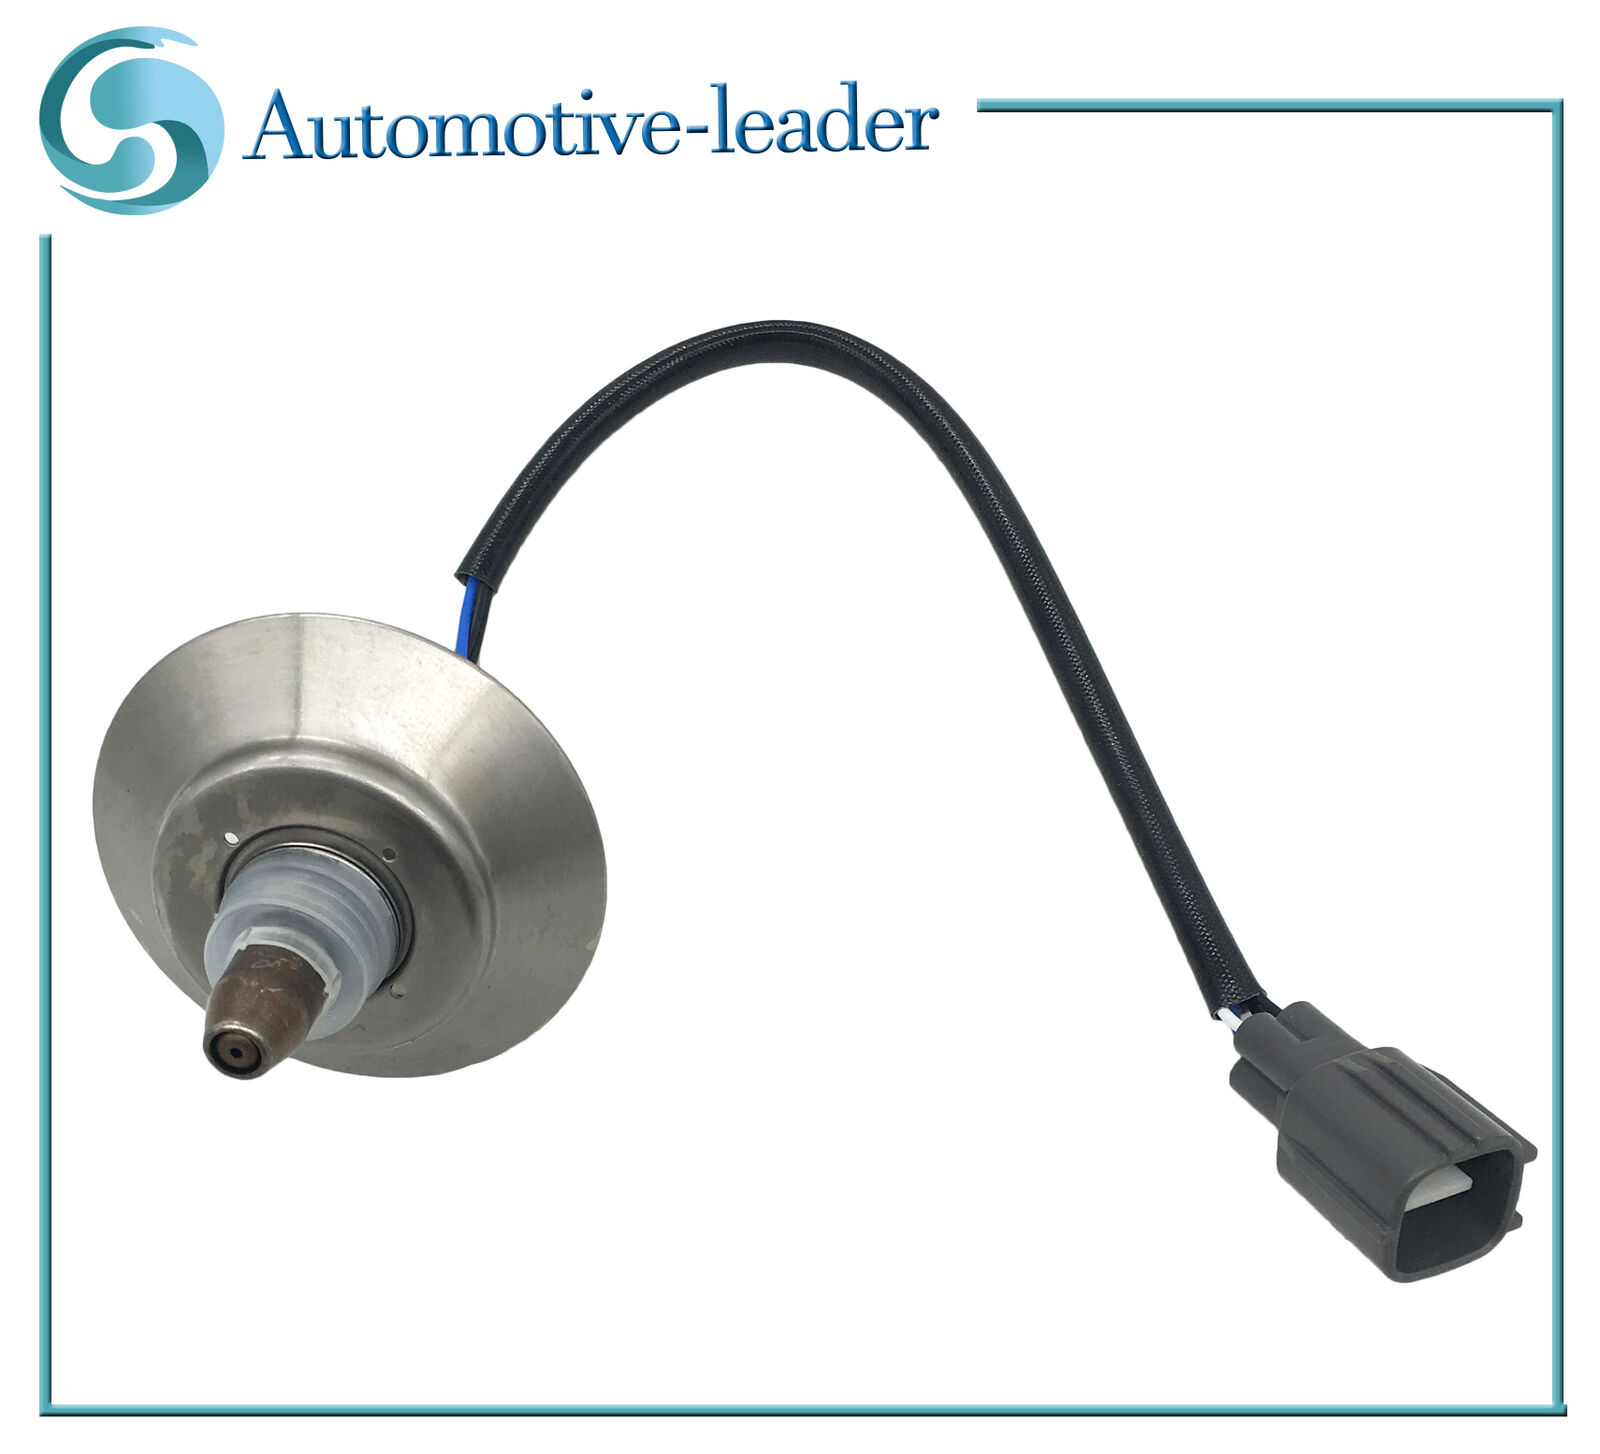 New Oxygen Sensor Lambda 02 sensor 4-wire For 10-11 Toyota Camry 89467-73010